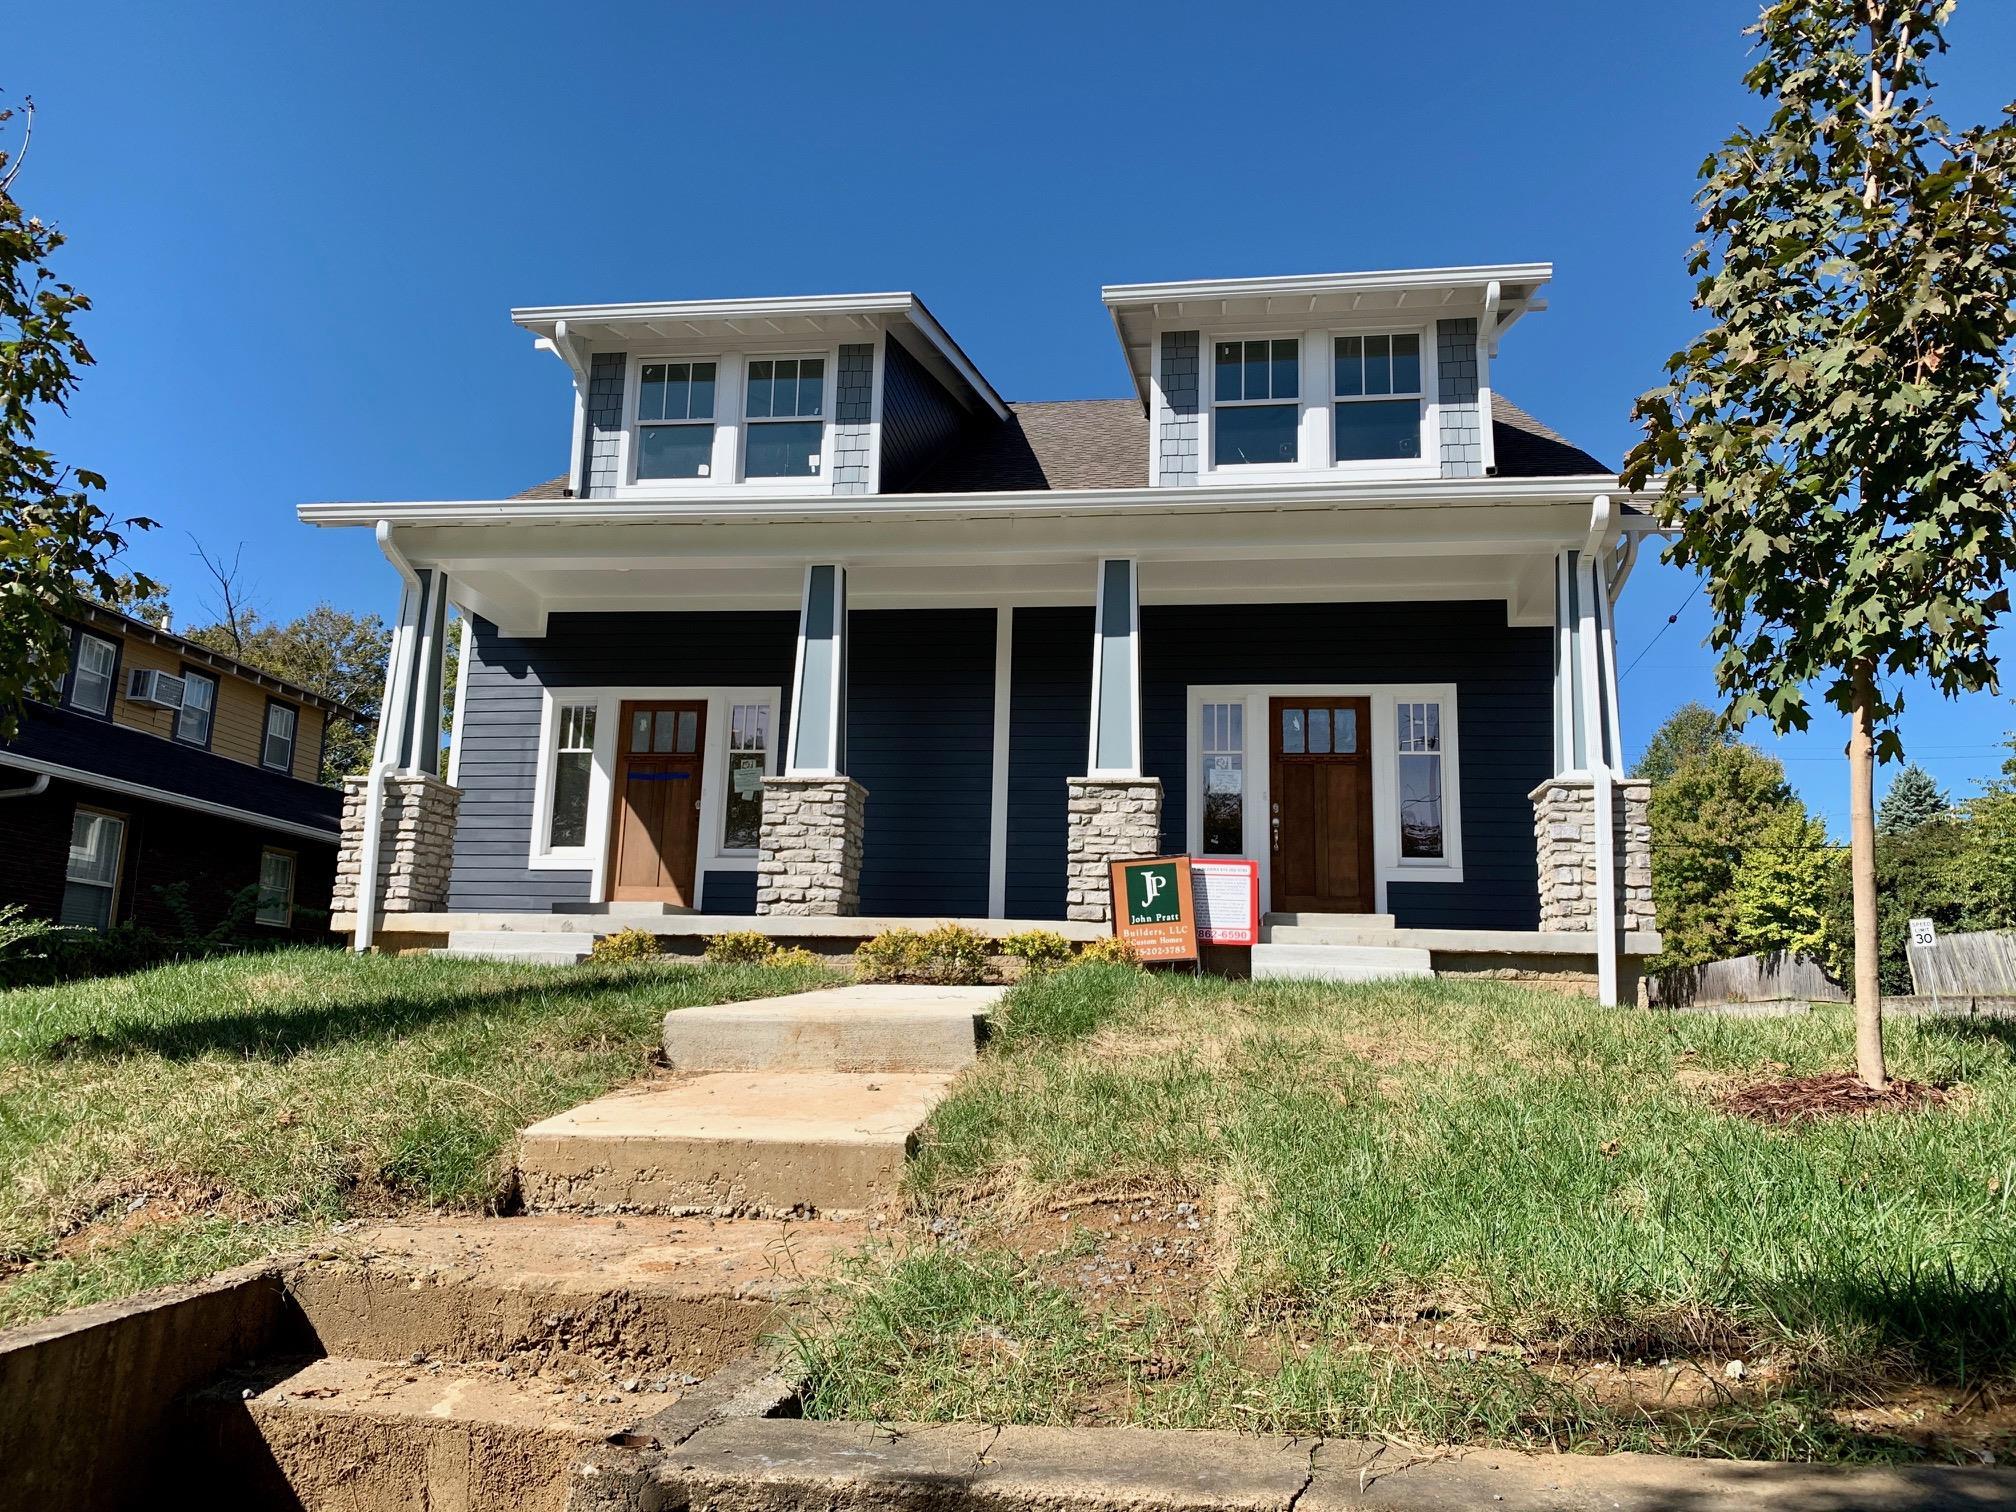 719 Shelby Ave, Nashville, TN 37206 - Nashville, TN real estate listing